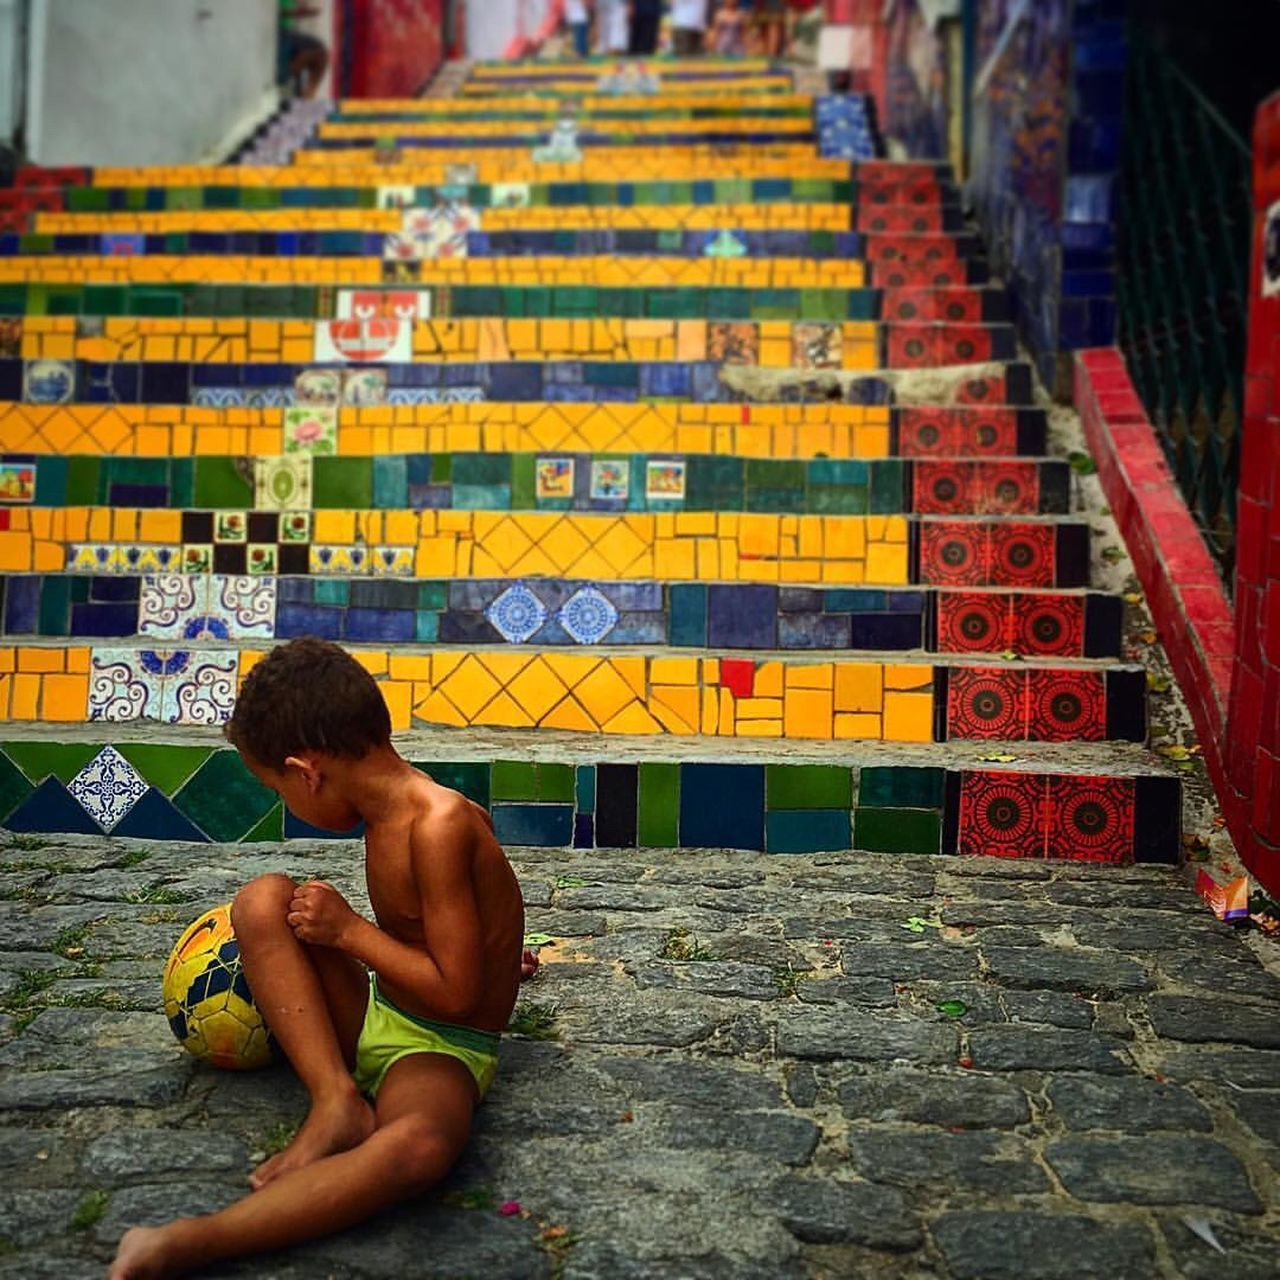 ֹ🏆 Fotografia vencedora do CONCURSO NACIONAL NOVOS FOTÓGRAFOS PRÊMIO URBS 2016/ Winning photograph NATIONAL CONTEST YOUNG PHOTOGRAPHERS - PRIZE URBS 2016 Hidden Gems  Colour Of Life Colors Colorful Streetphotography Street Streetphoto